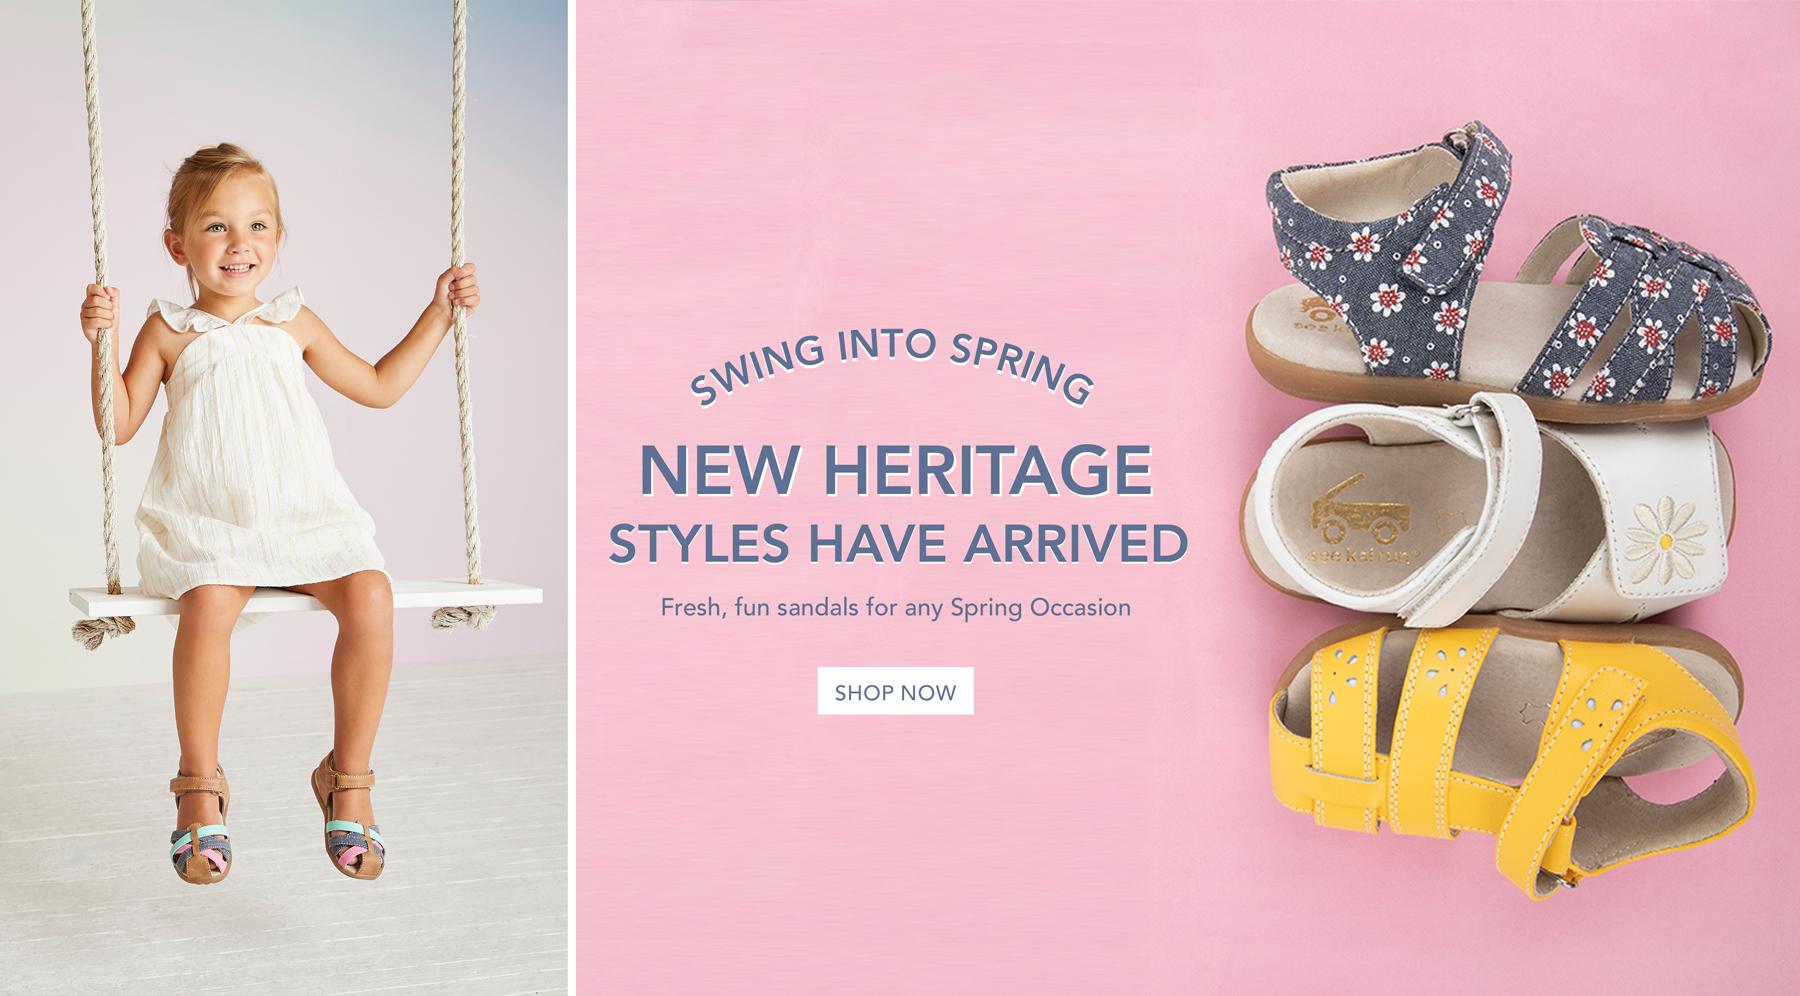 spring-heritage-banner.jpg